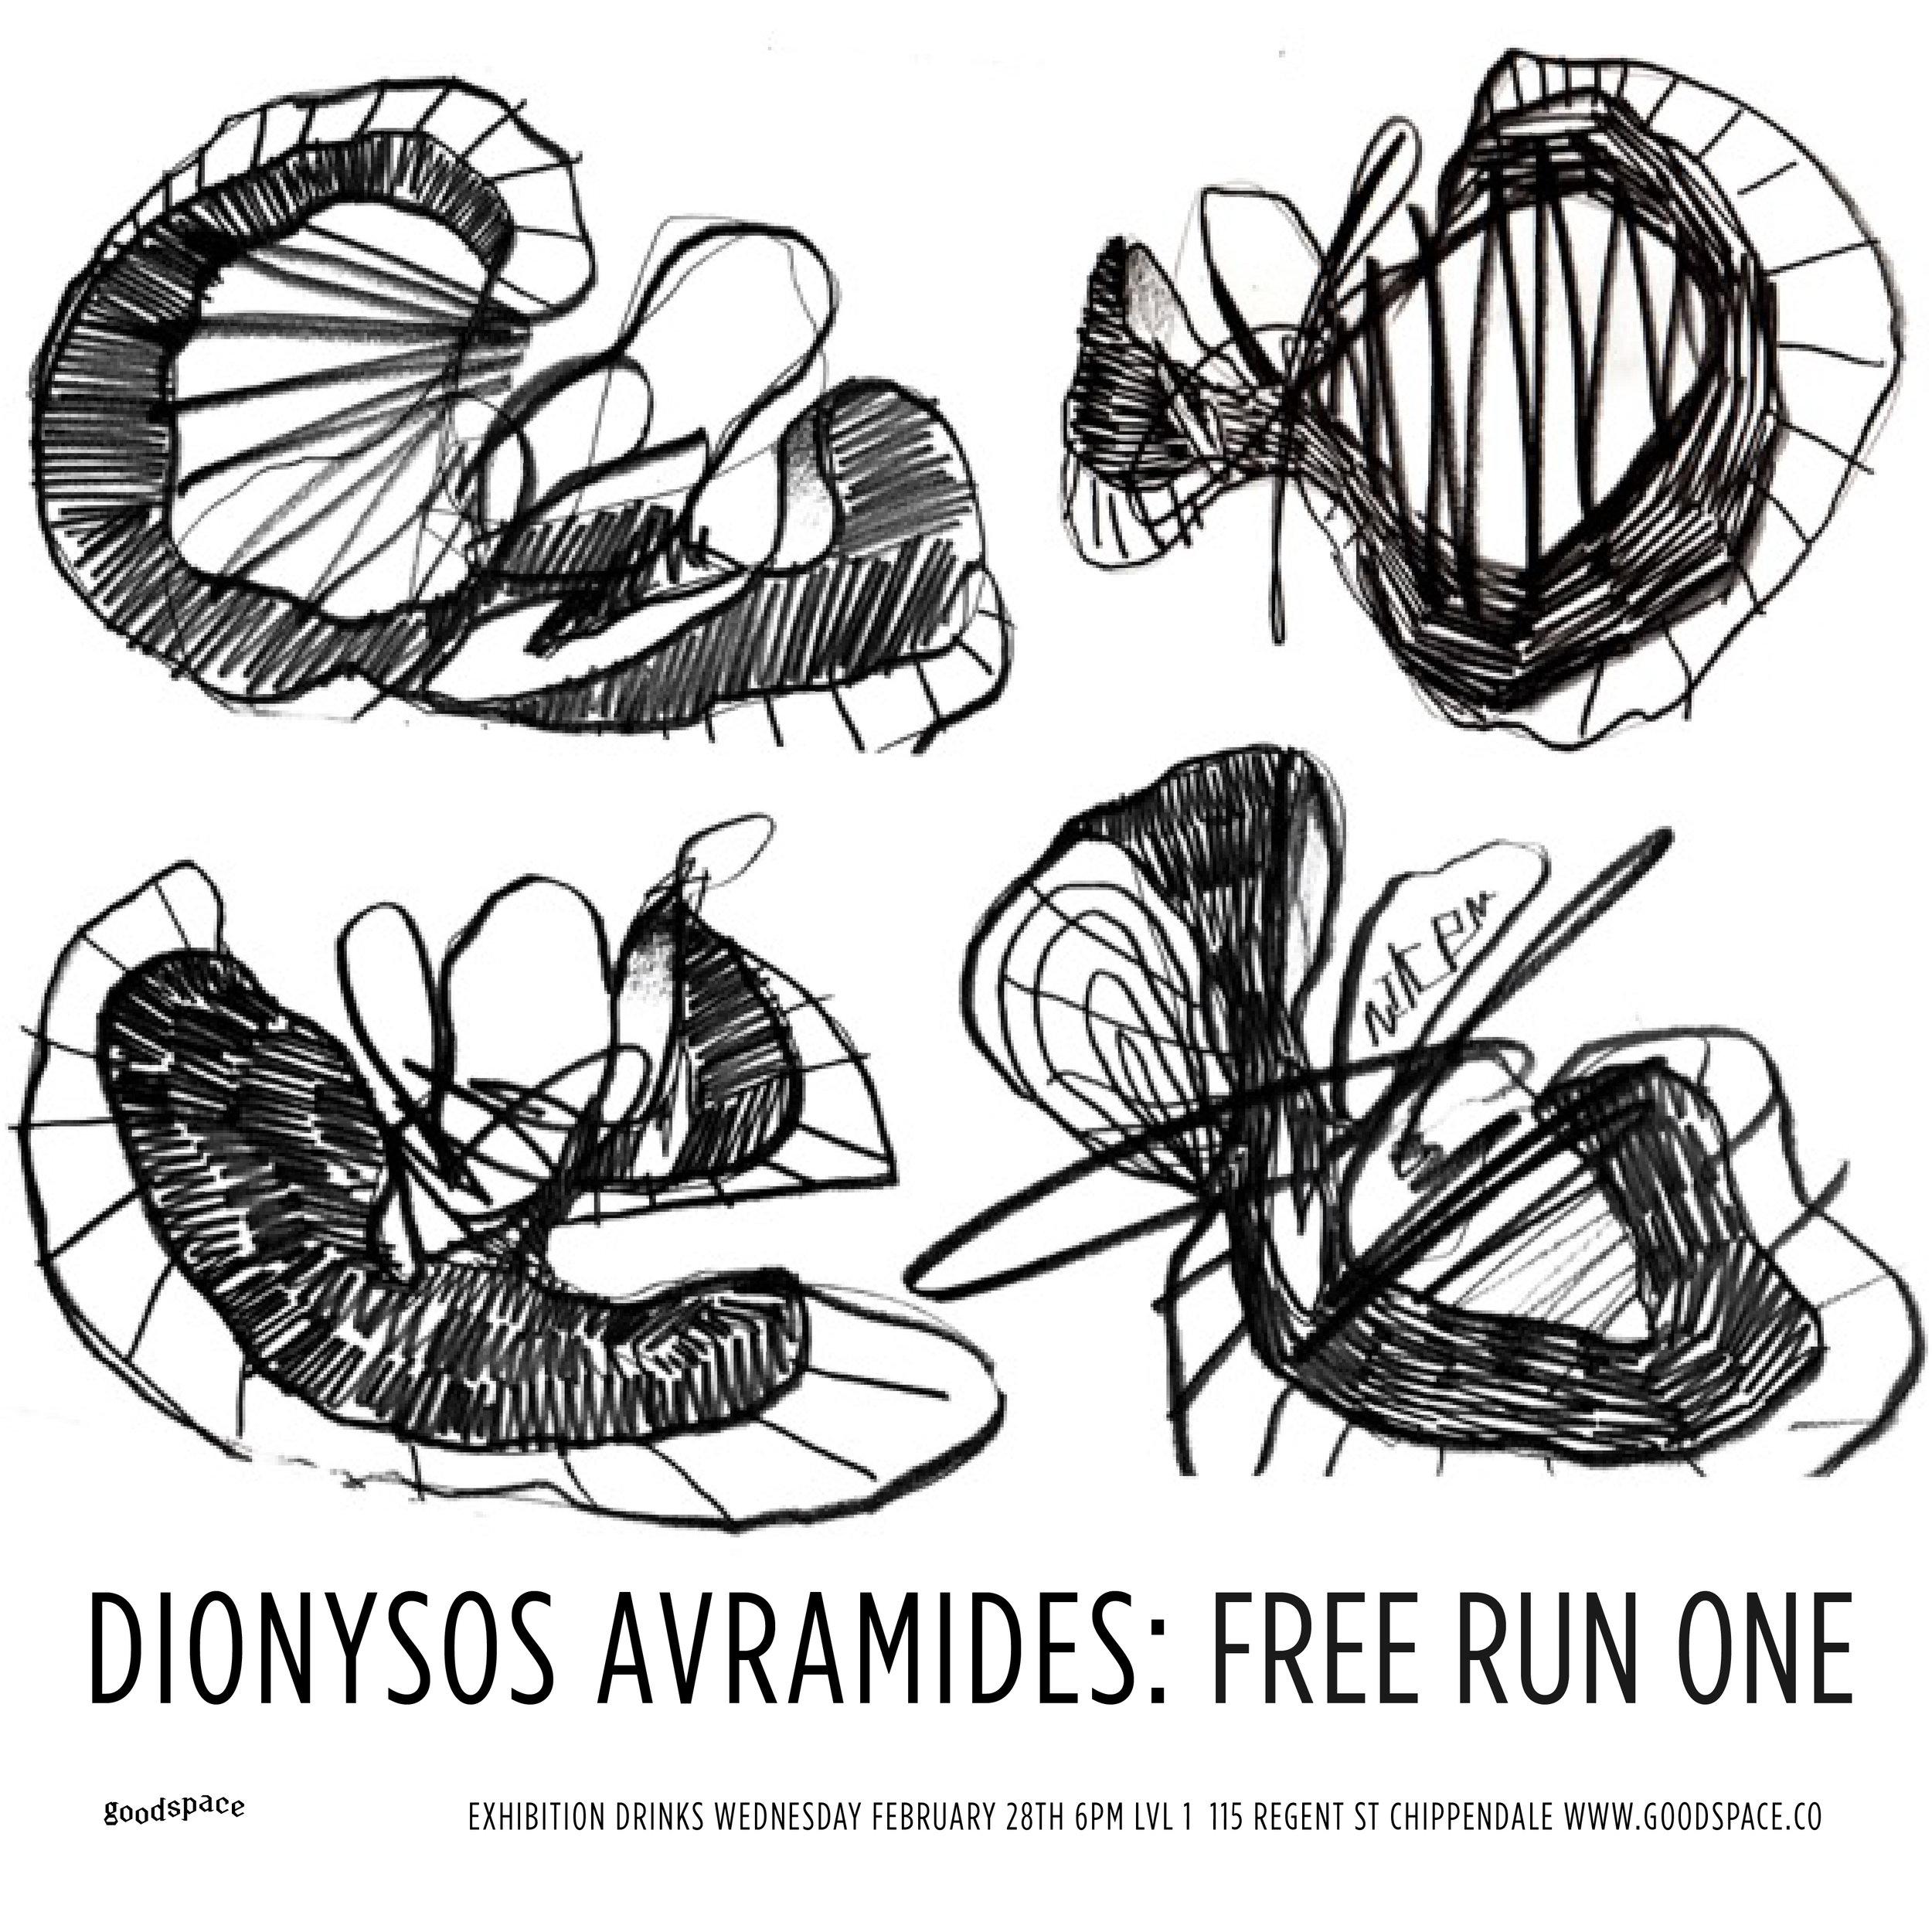 Dionysos Avramides Flyer.jpg